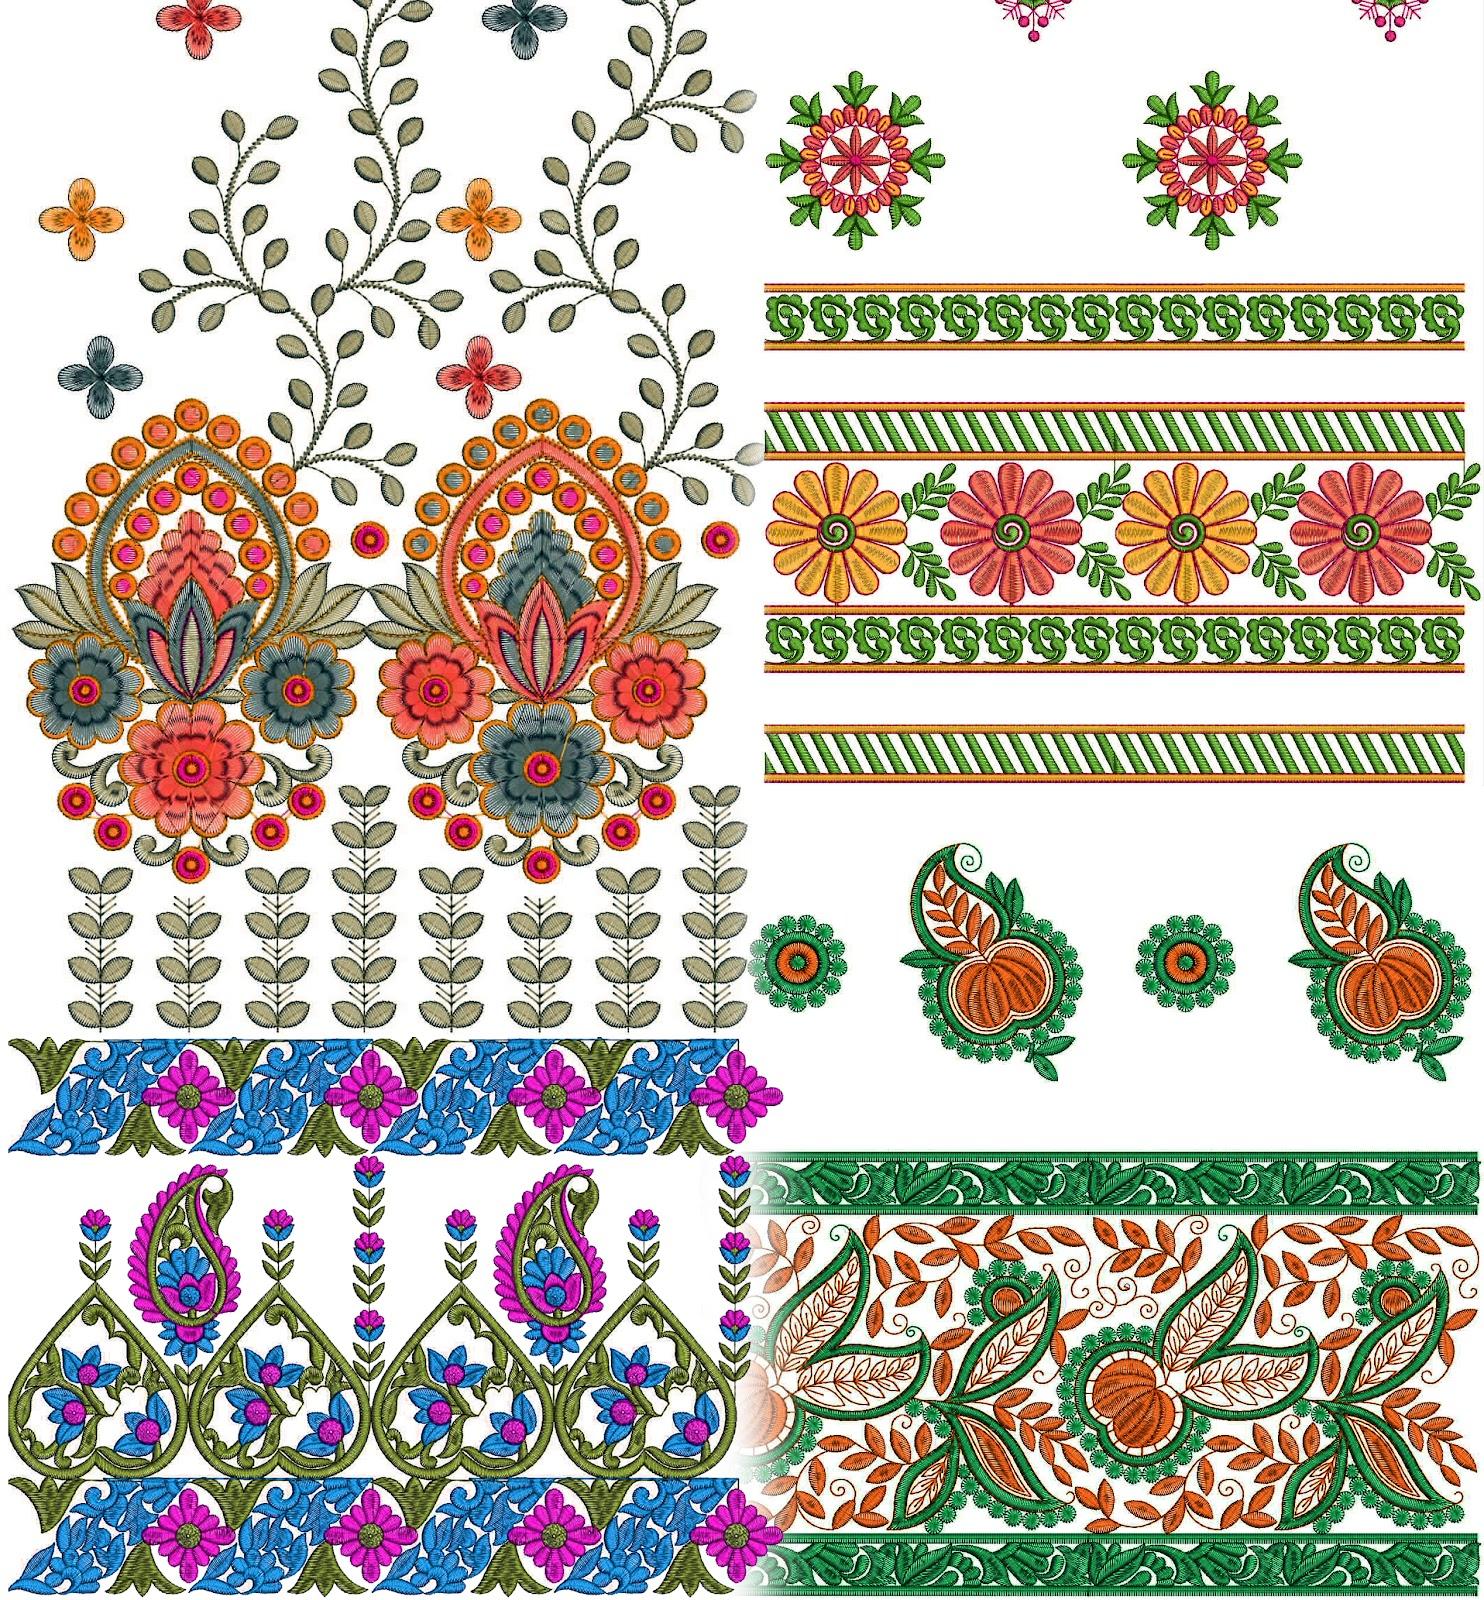 Embroidery Meaning In Gujarati | Makaroka.com